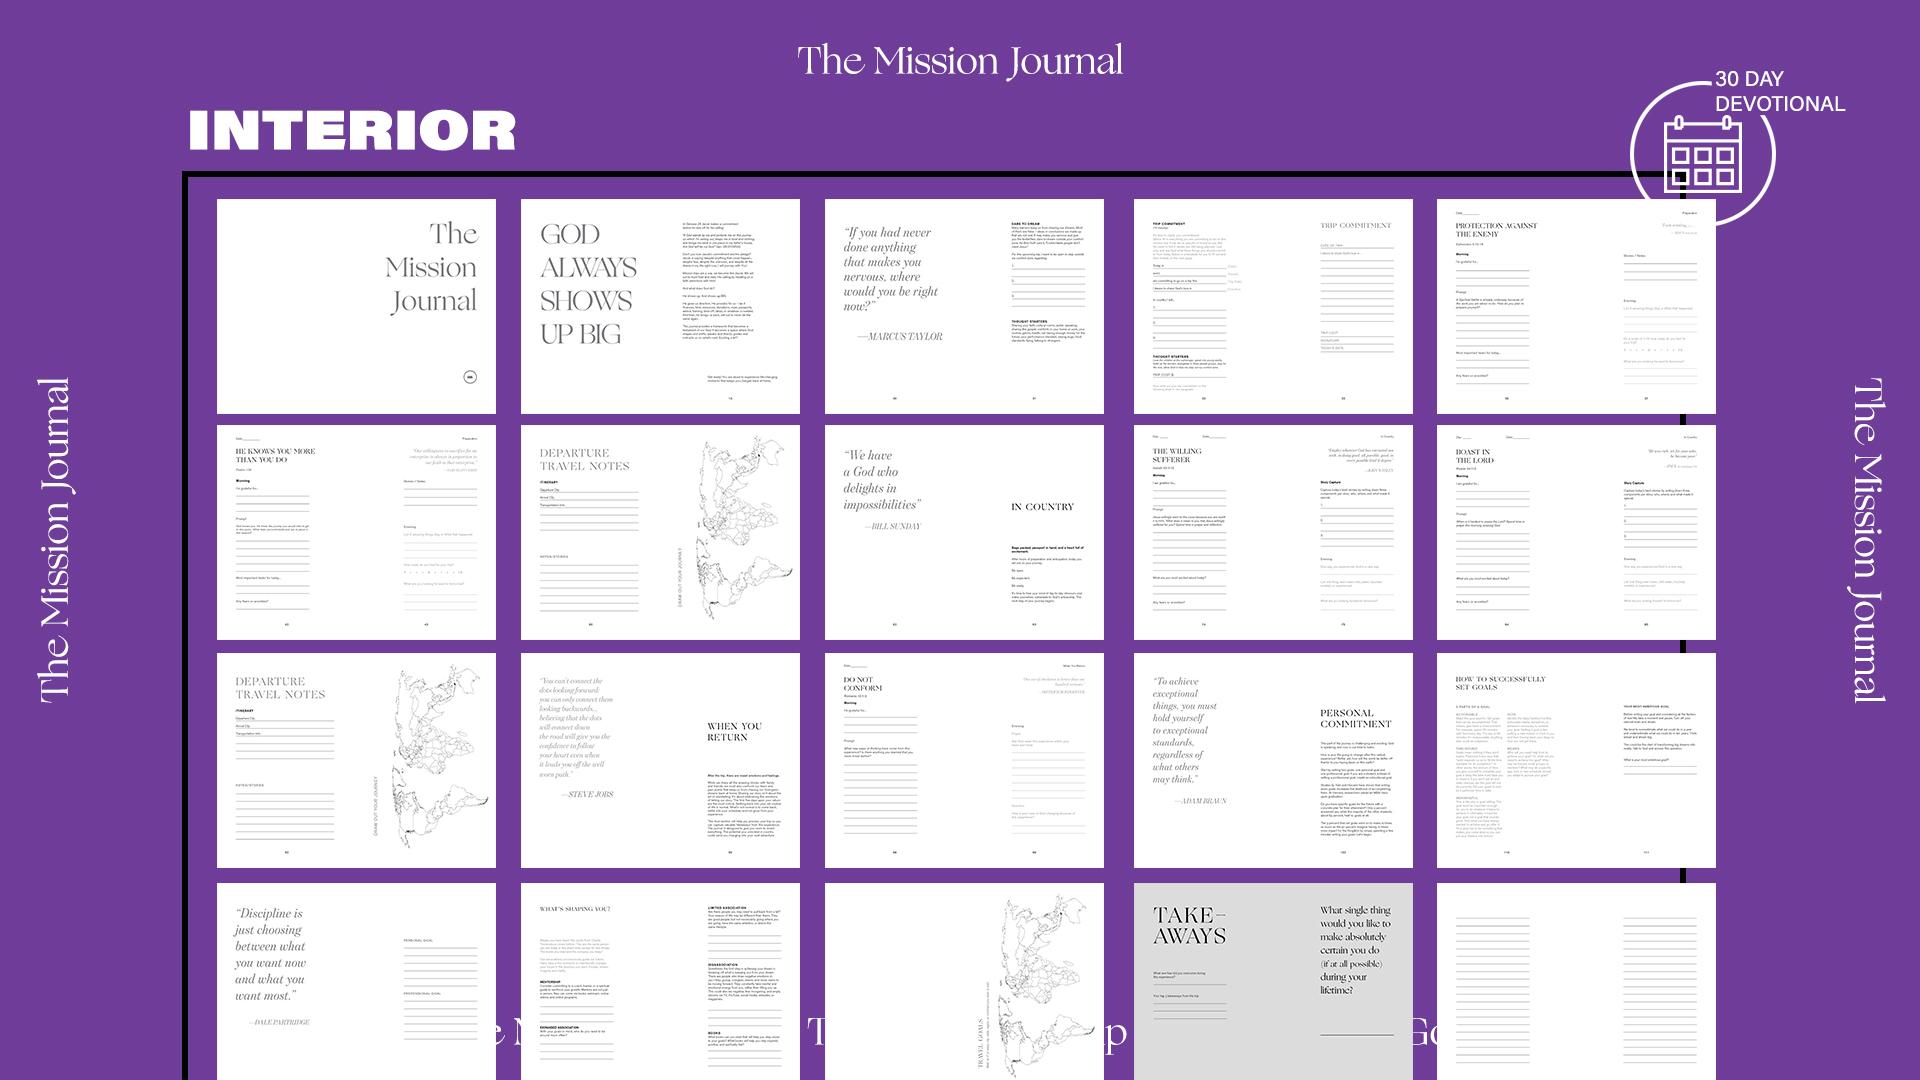 Mission Trip Journal30 Day Devotional Mission Journal Interior.jpg